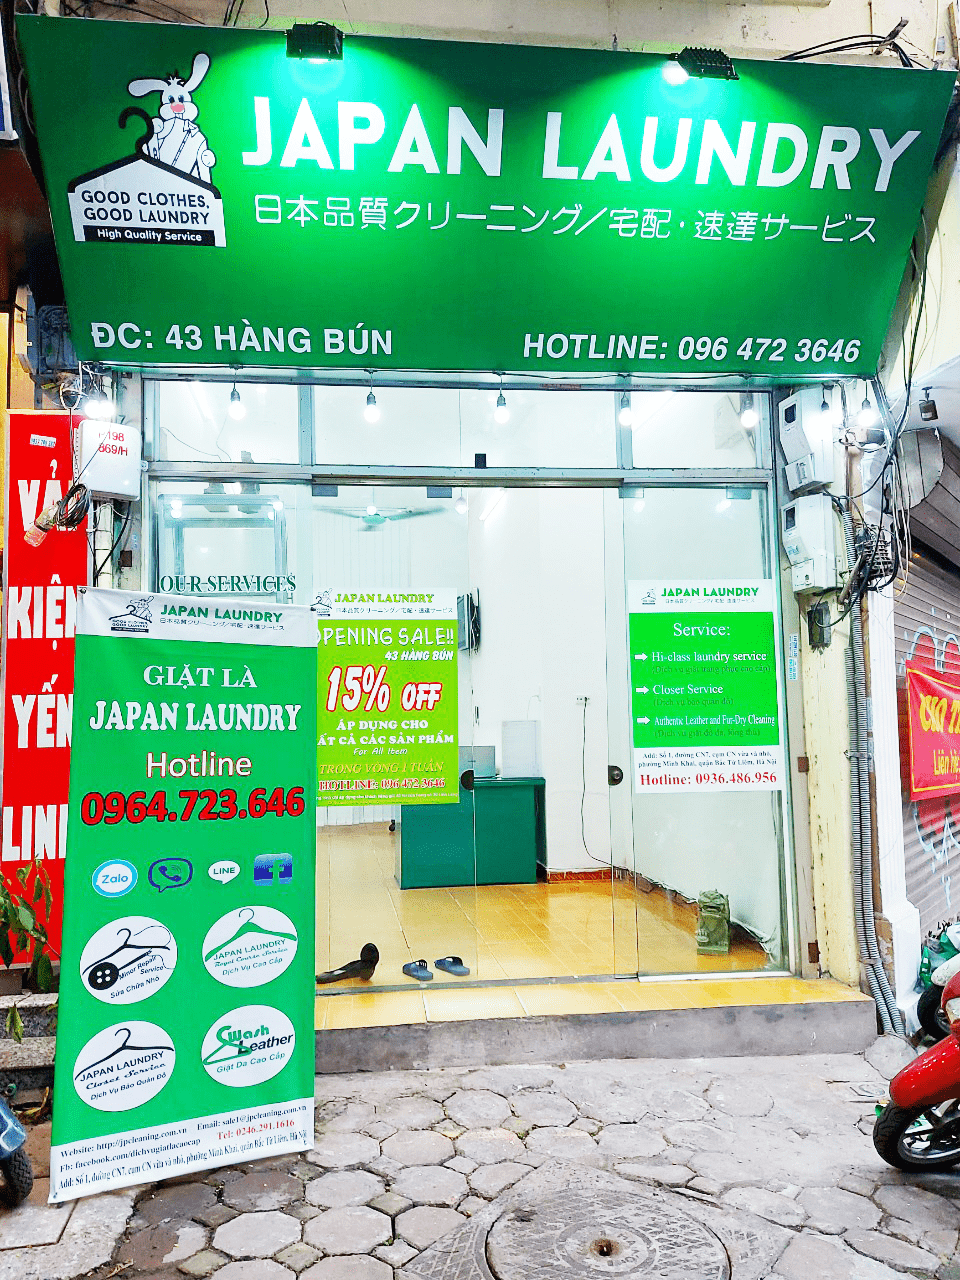 Japan Laundry